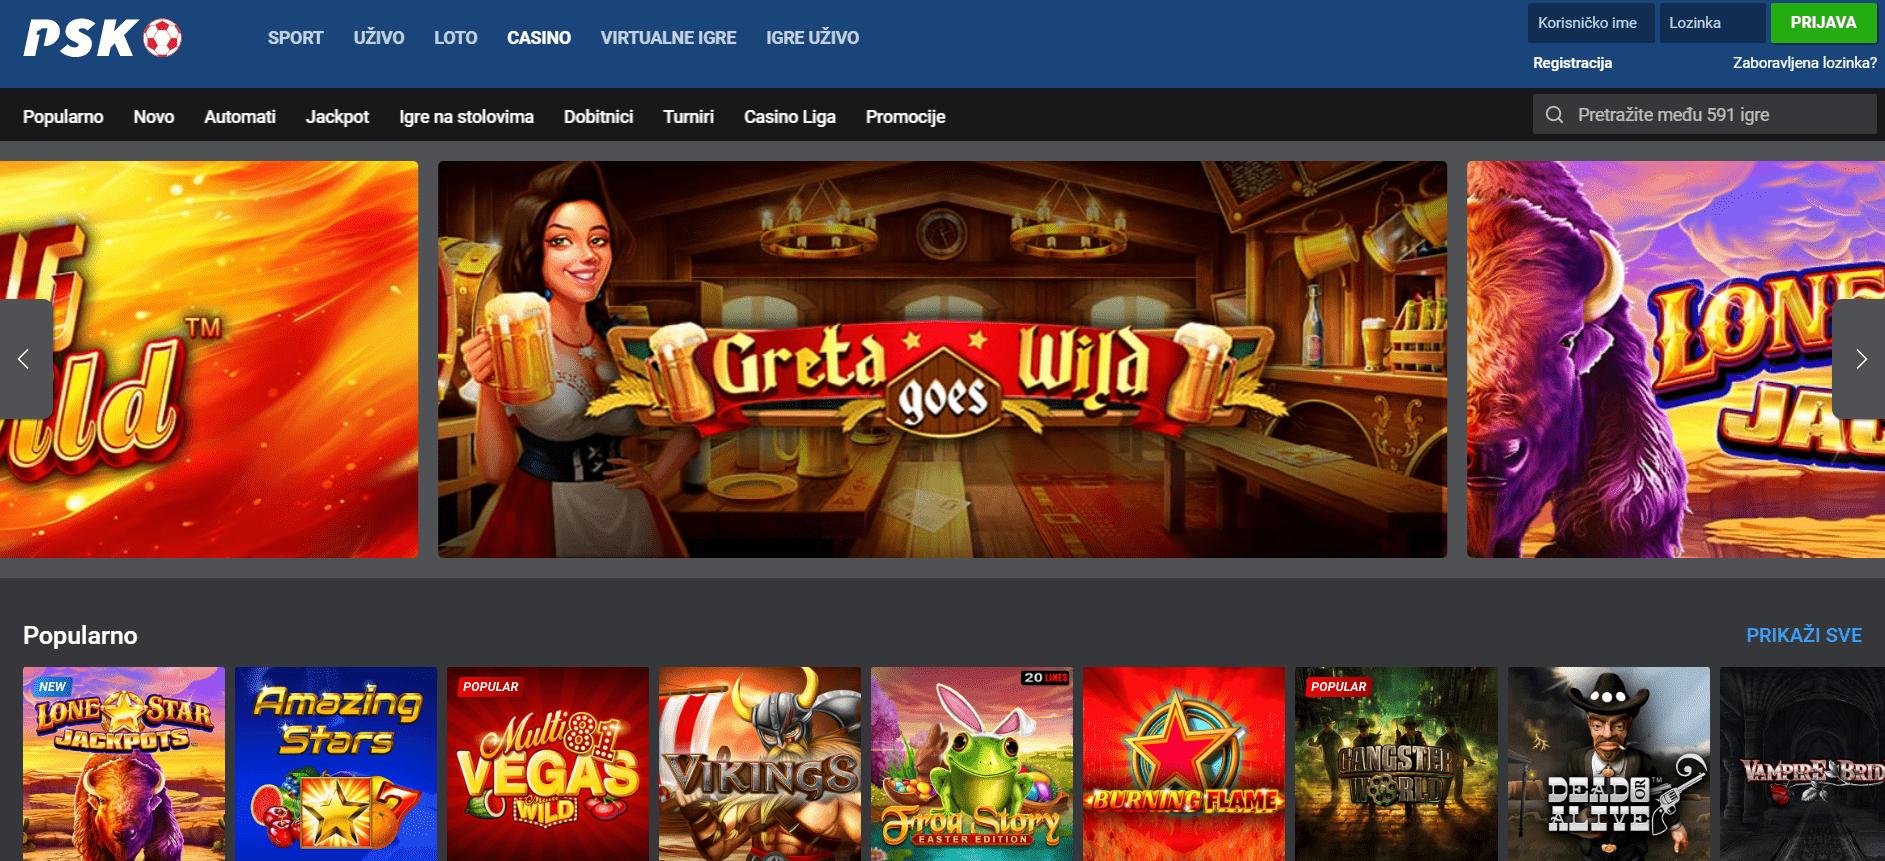 psk online casino